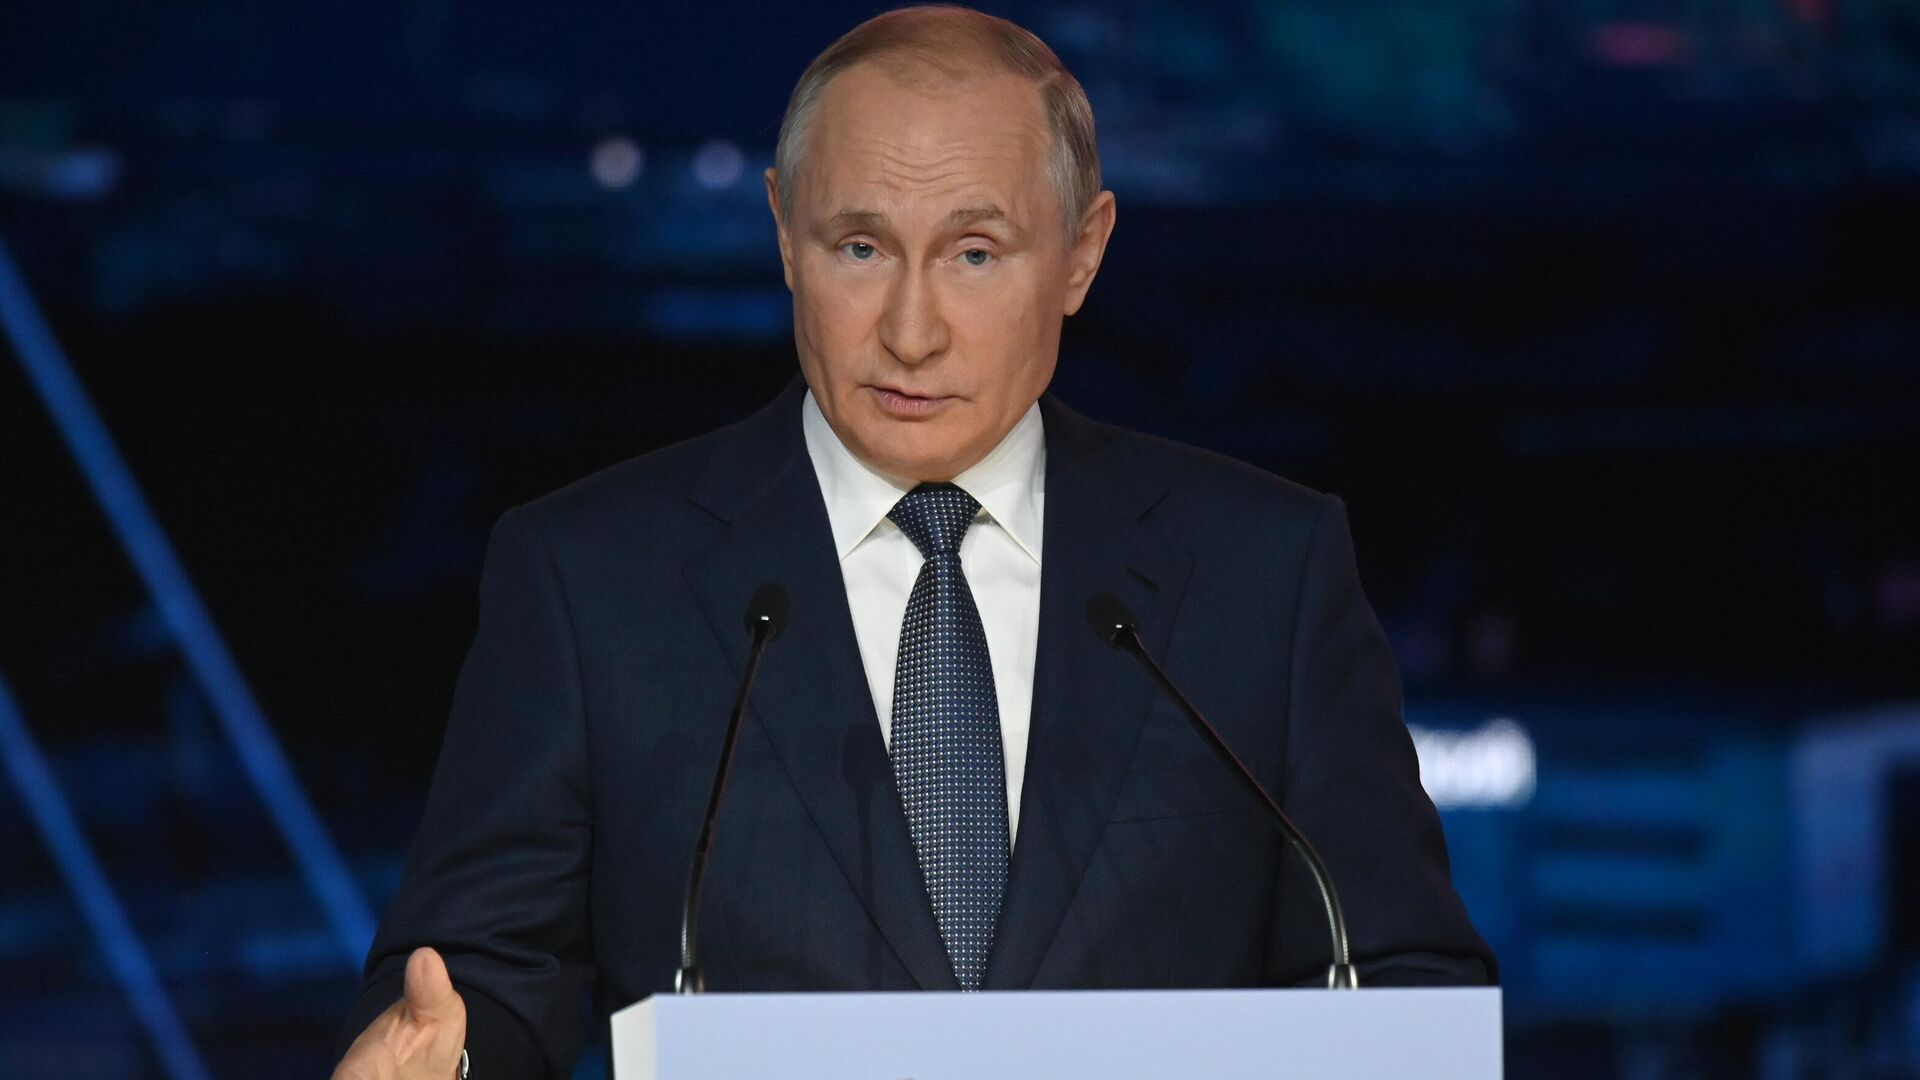 Vladímir Putin, presidente de Rusia - Sputnik Mundo, 1920, 14.10.2021